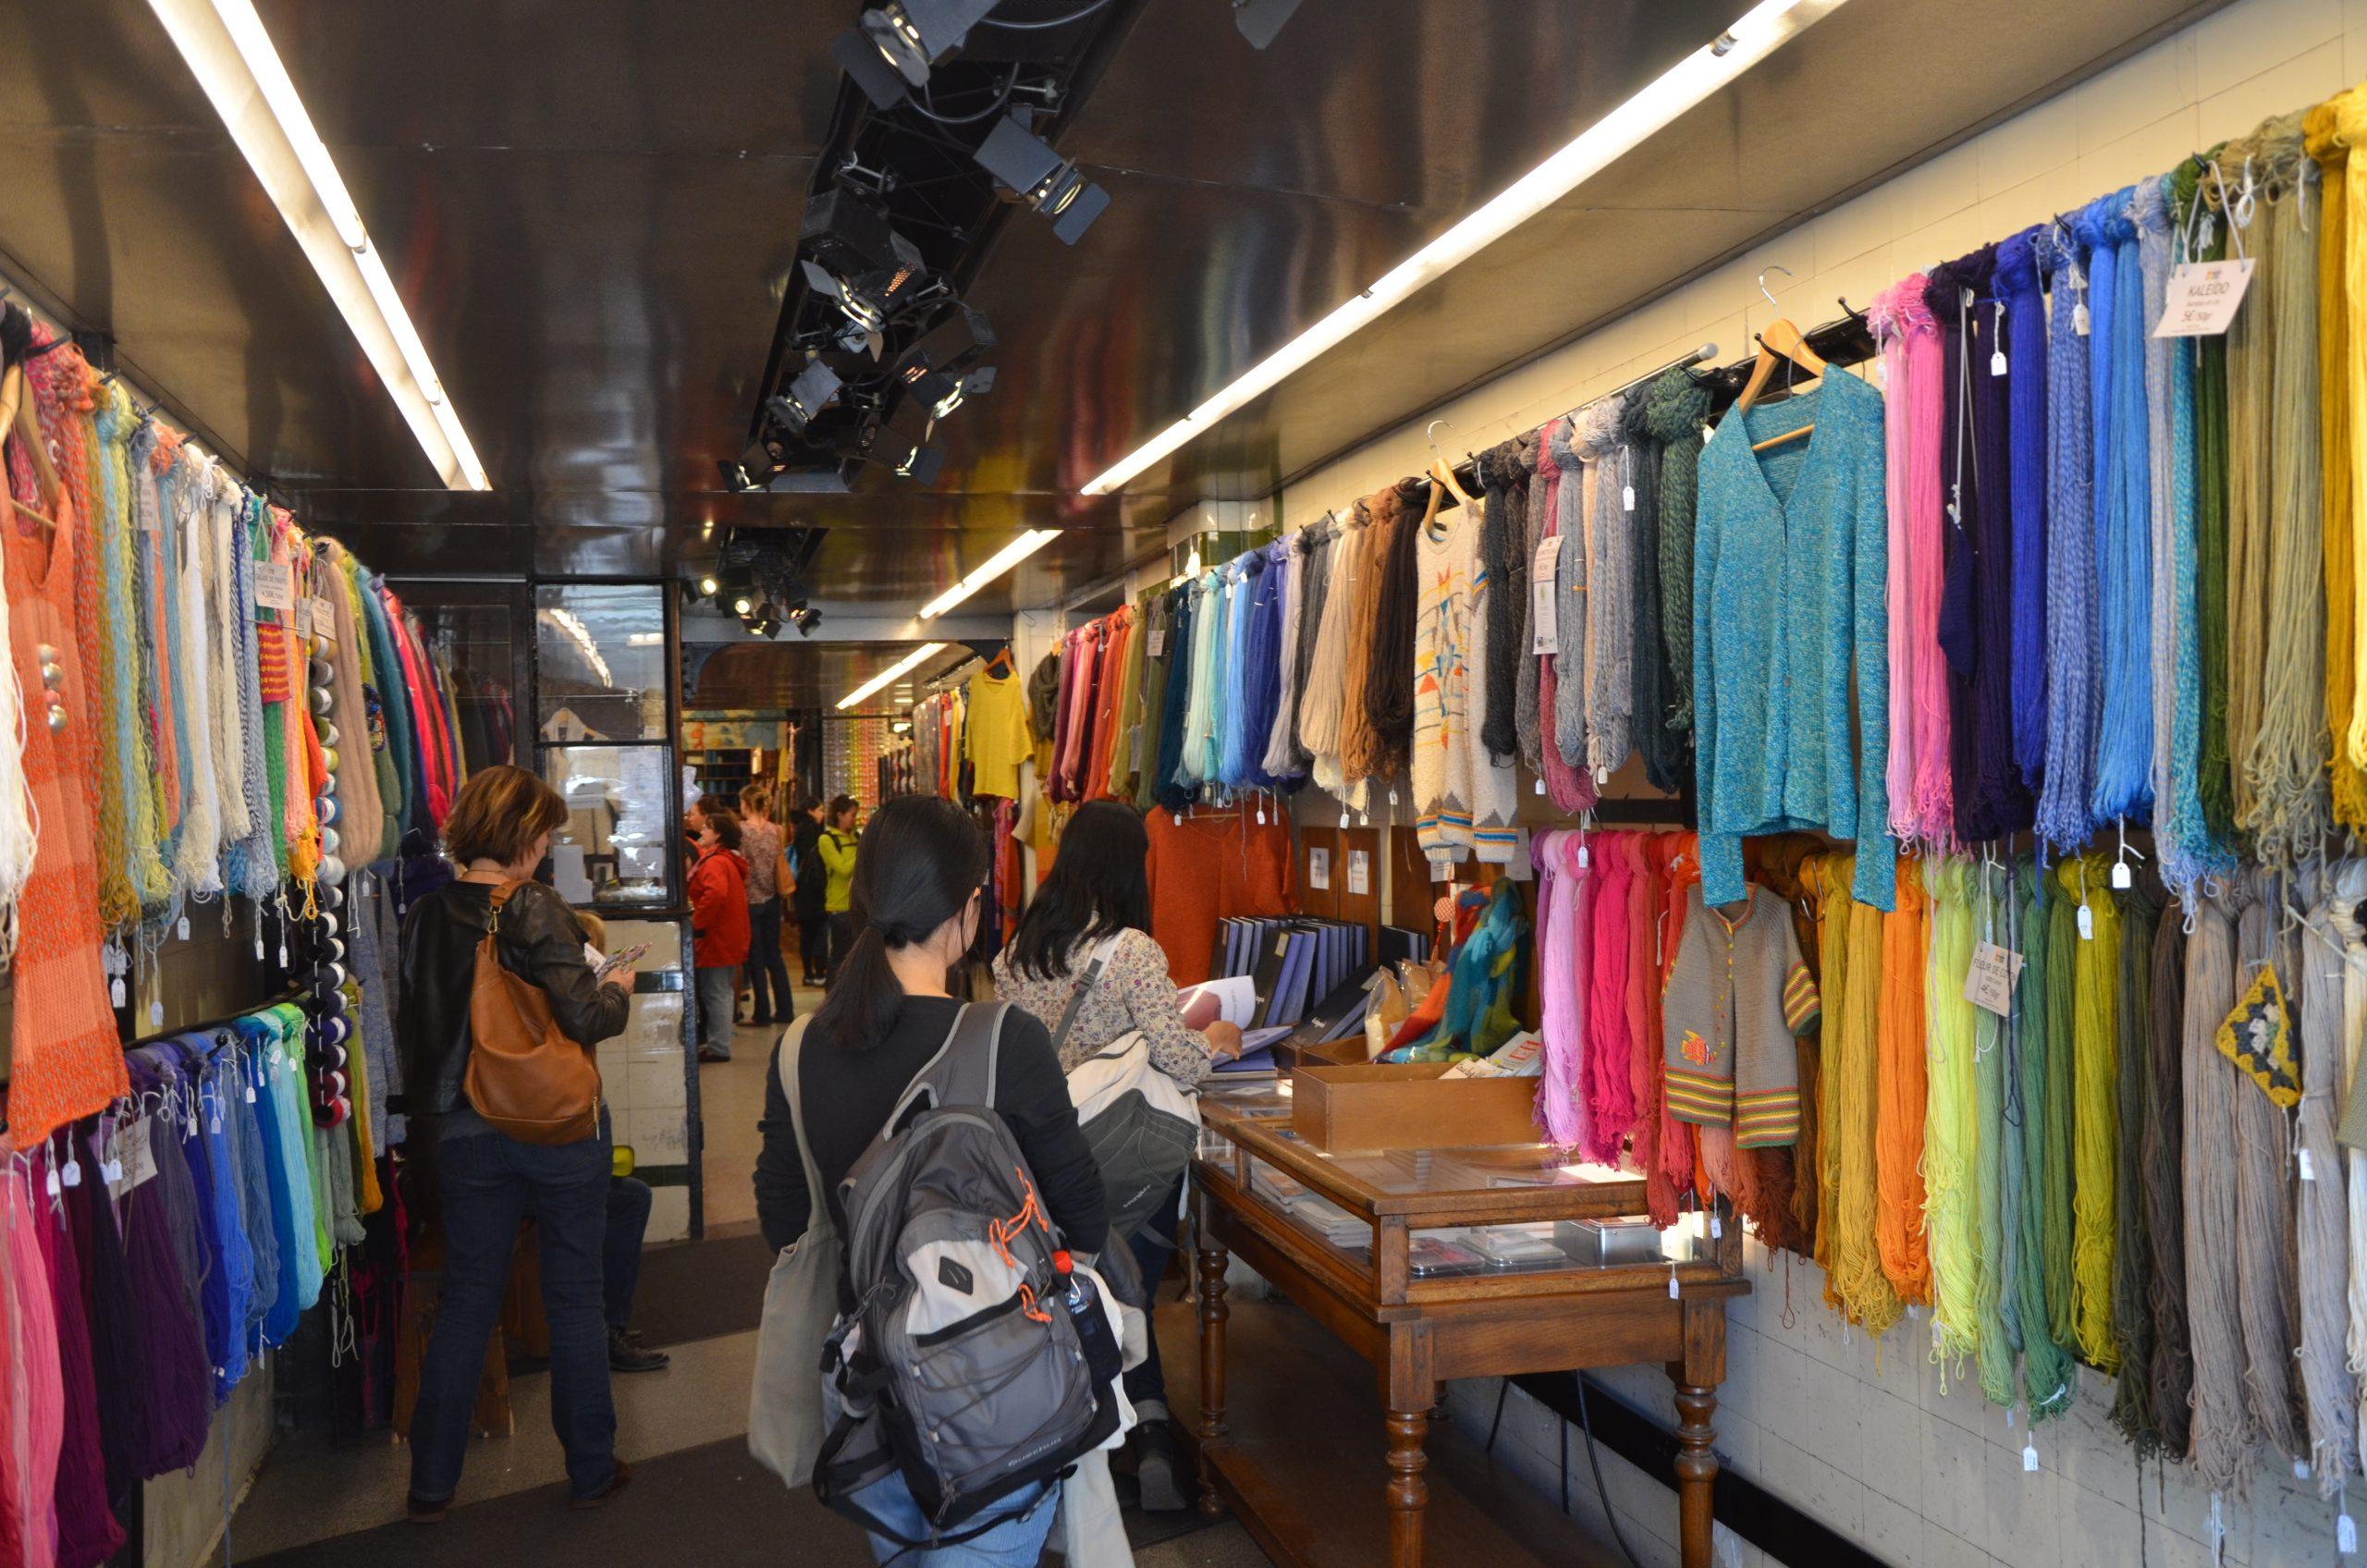 paris yarn shops ms mae travels. Black Bedroom Furniture Sets. Home Design Ideas